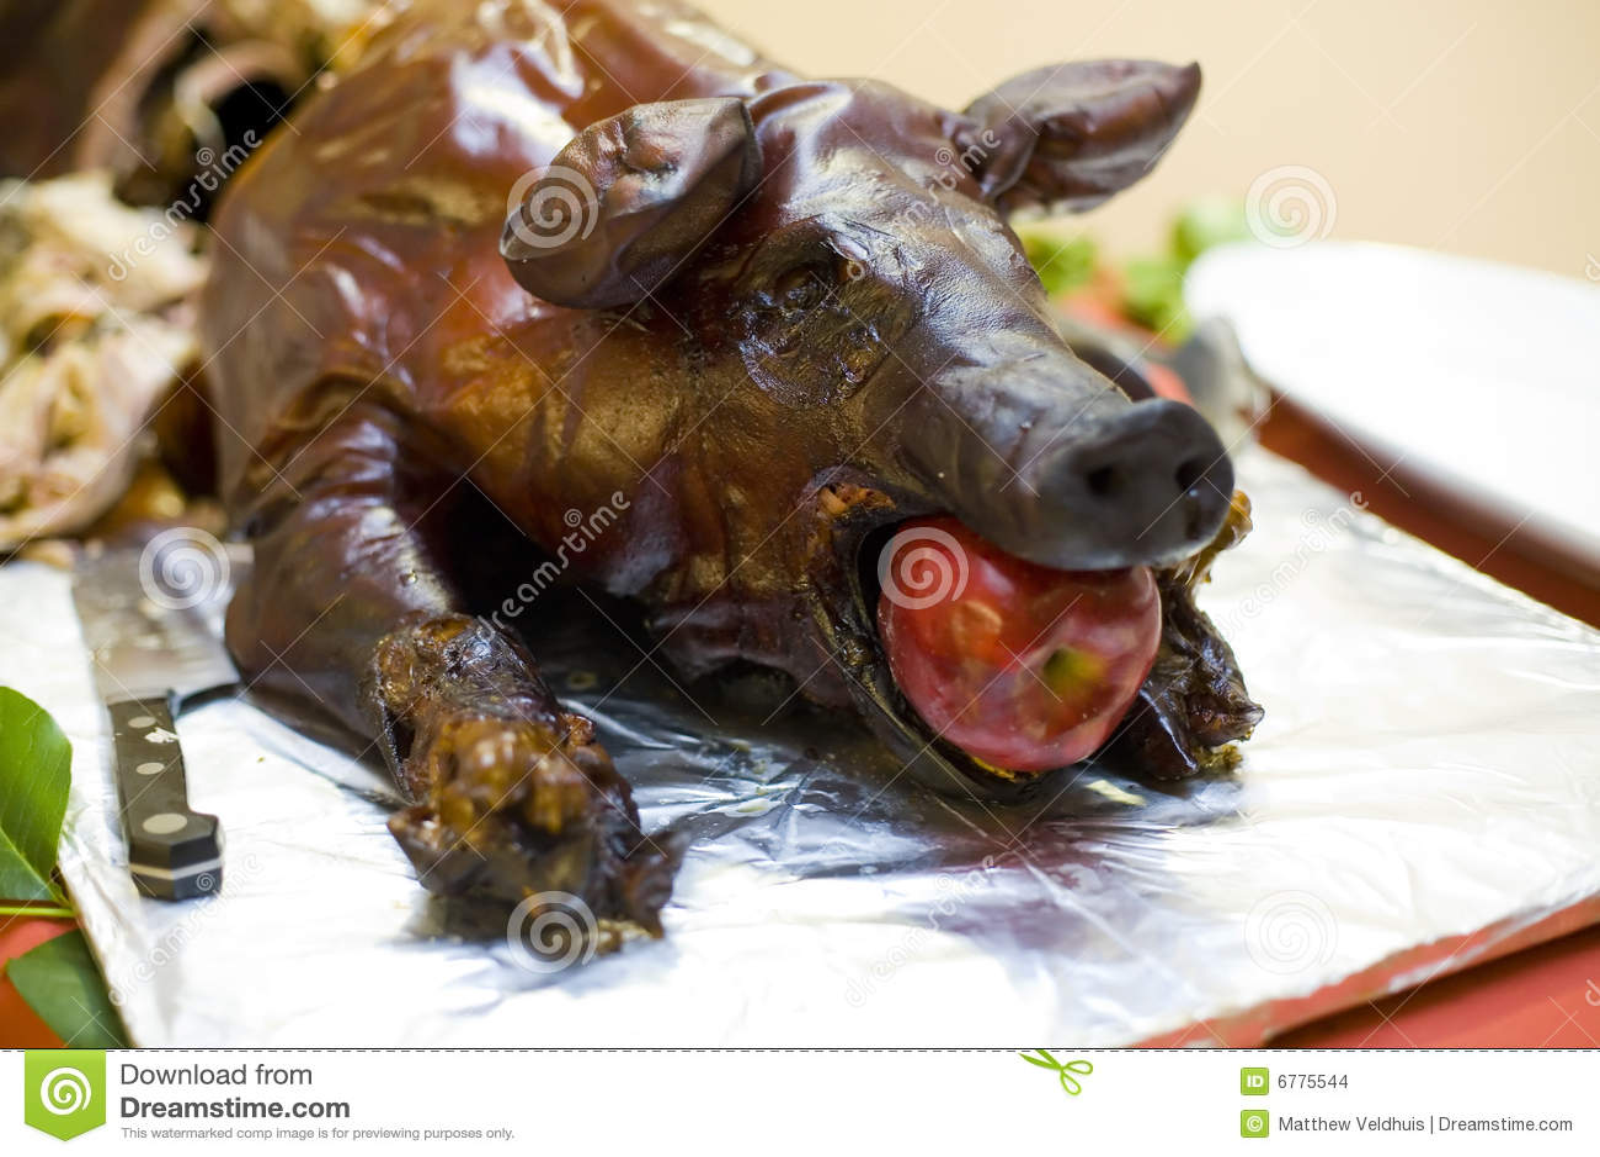 cerdo con manzanas